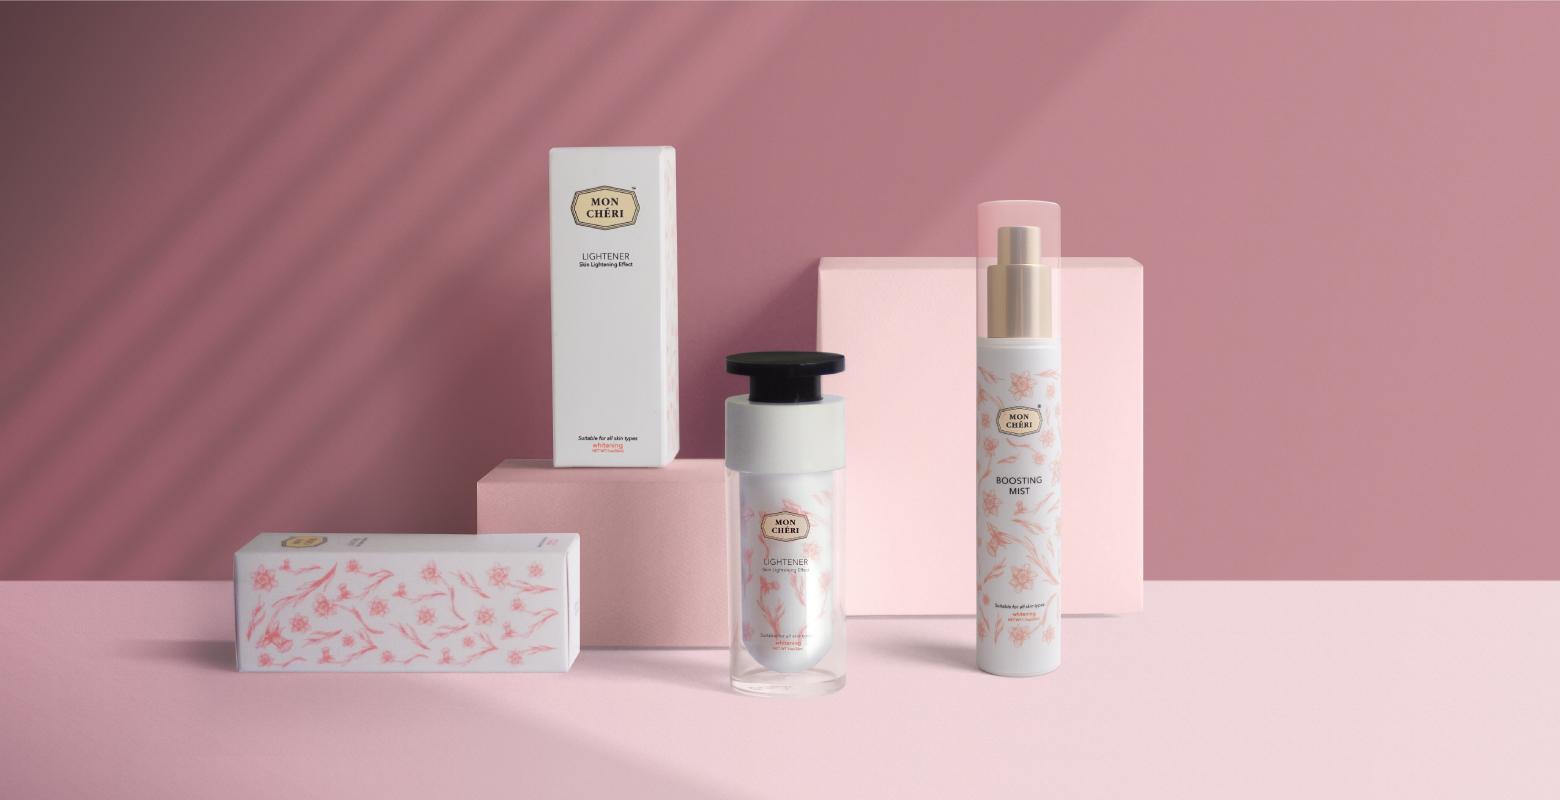 Mon Cheri Lightener Product Photo